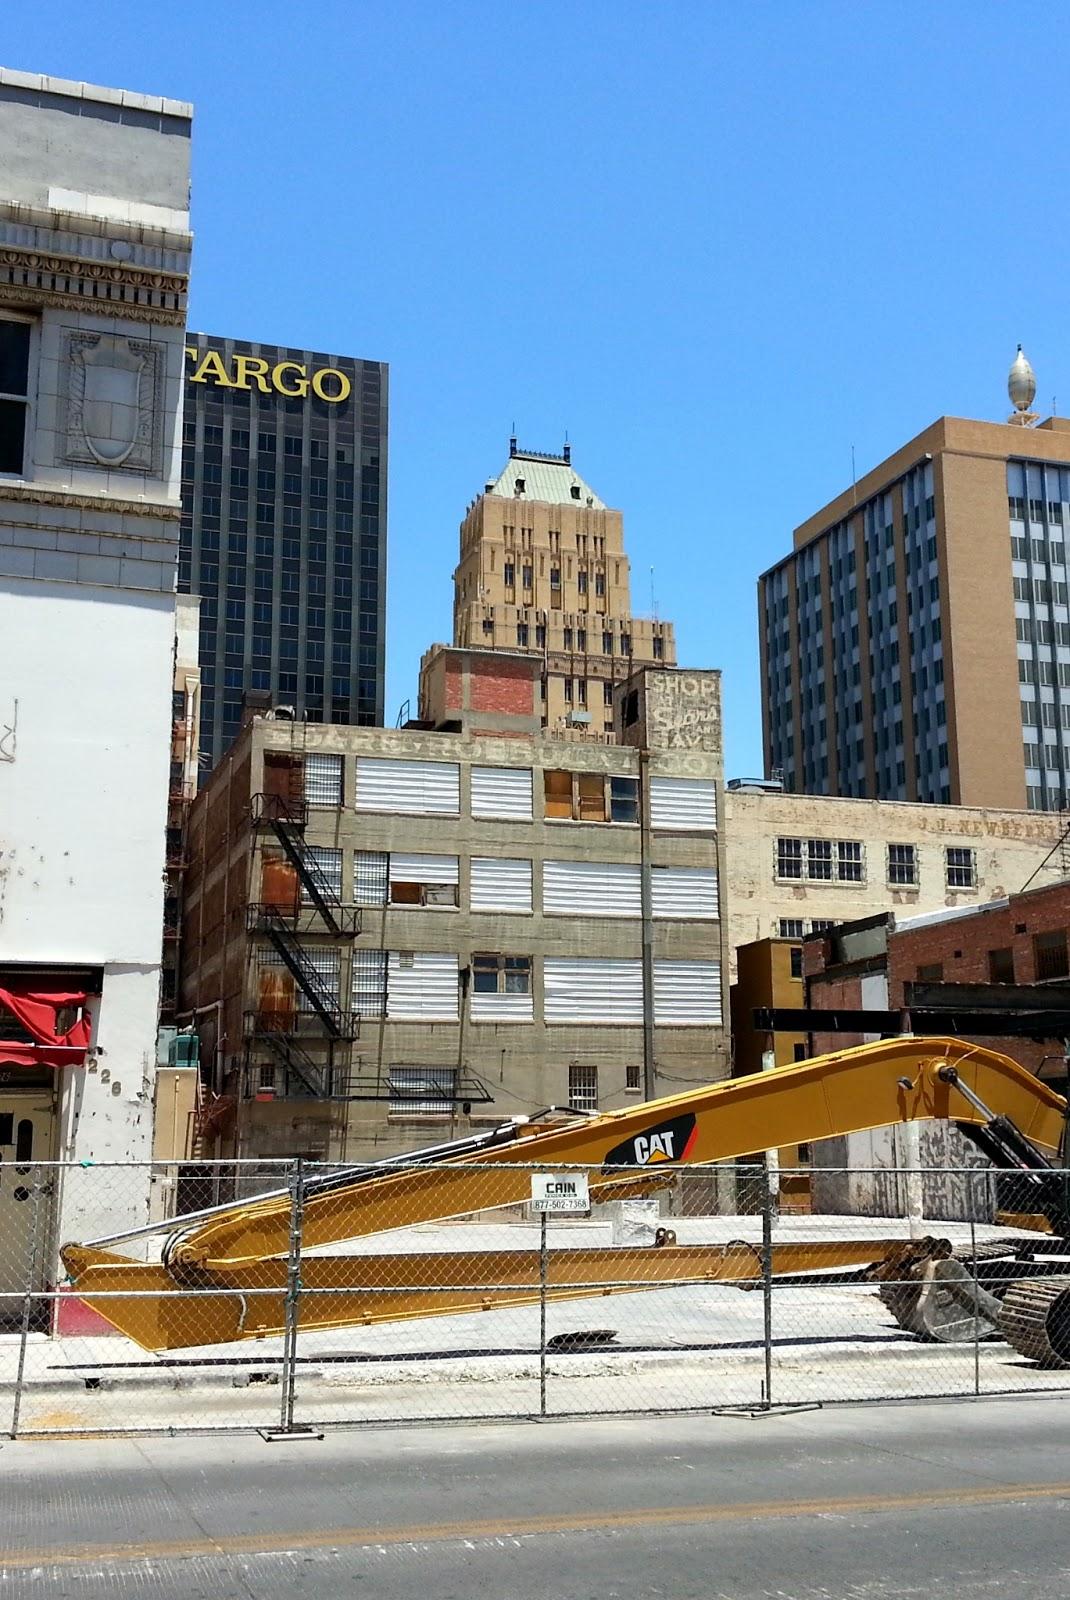 El paso development news july 2013 for New housing developments in el paso tx